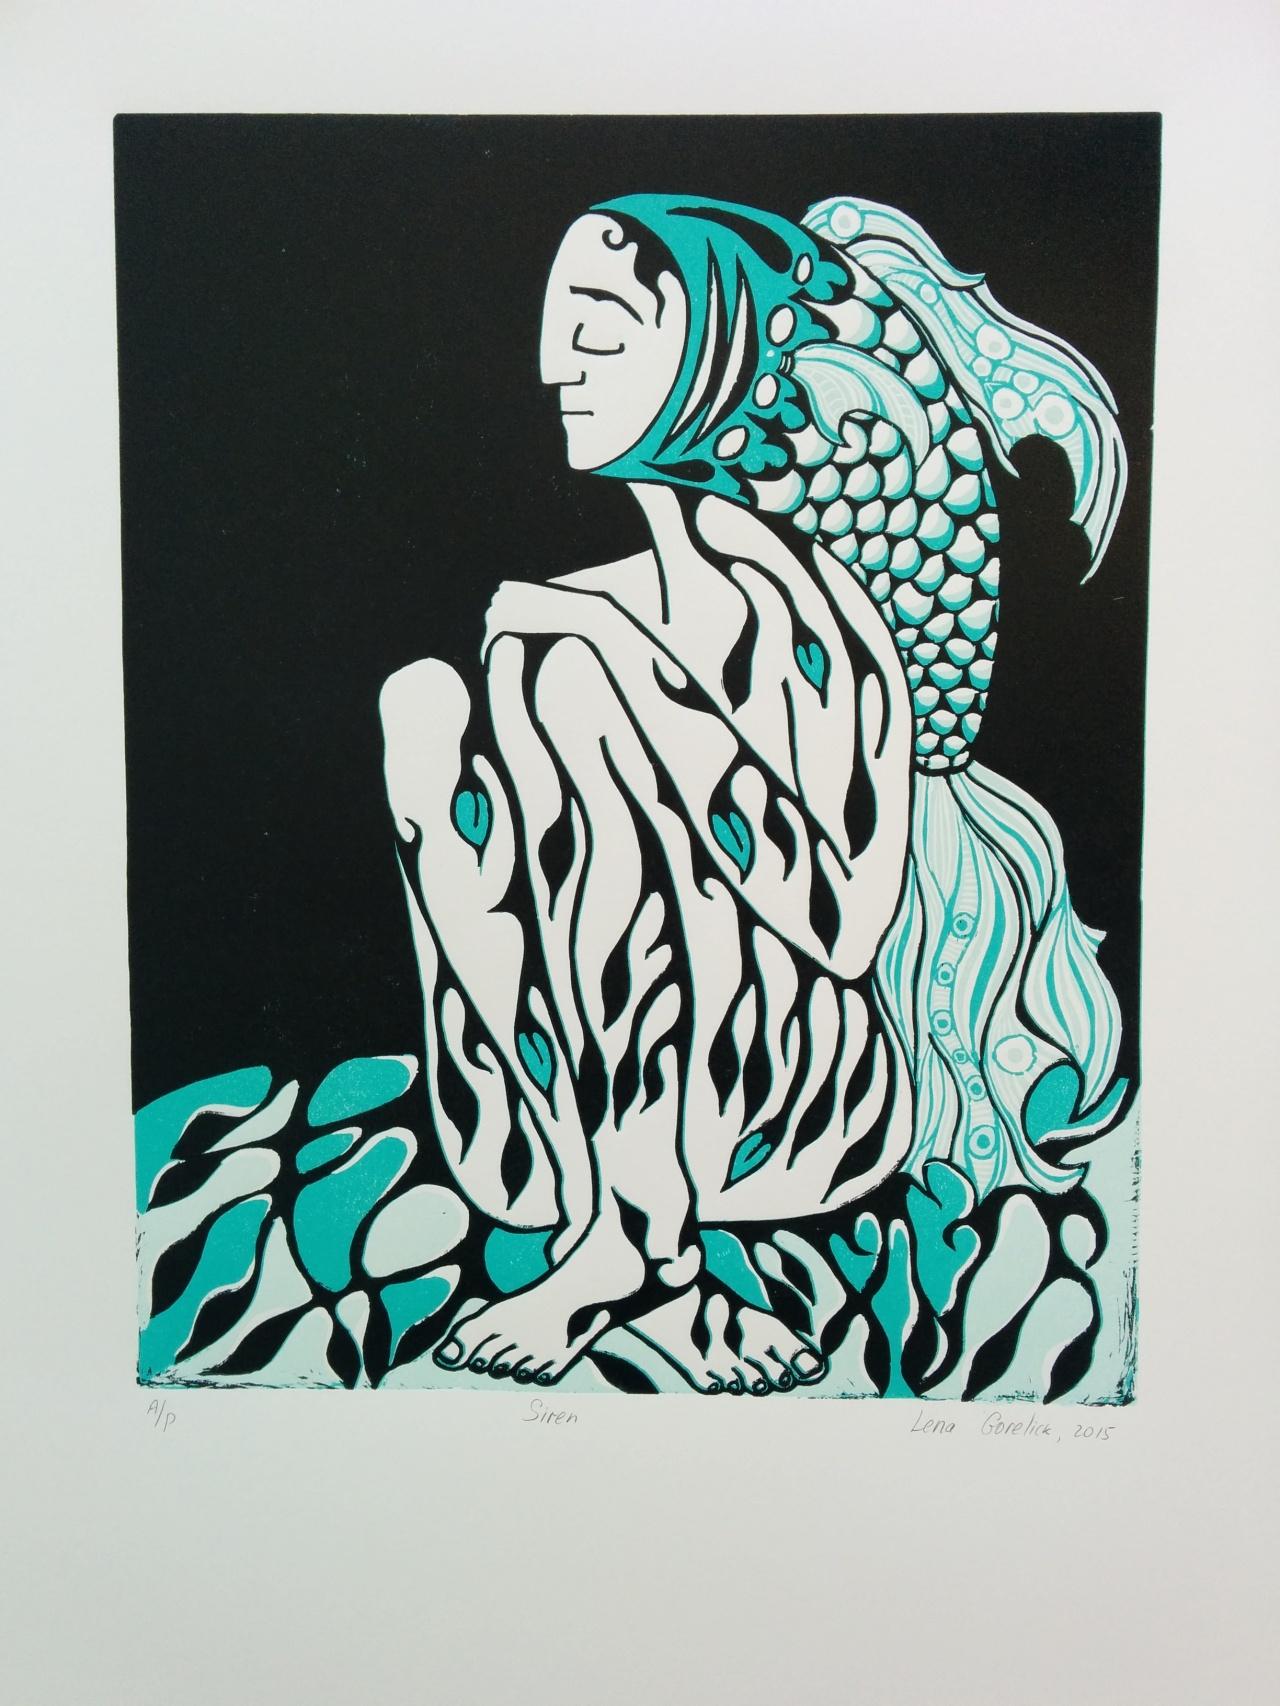 Siren – three color reduction reliefprint